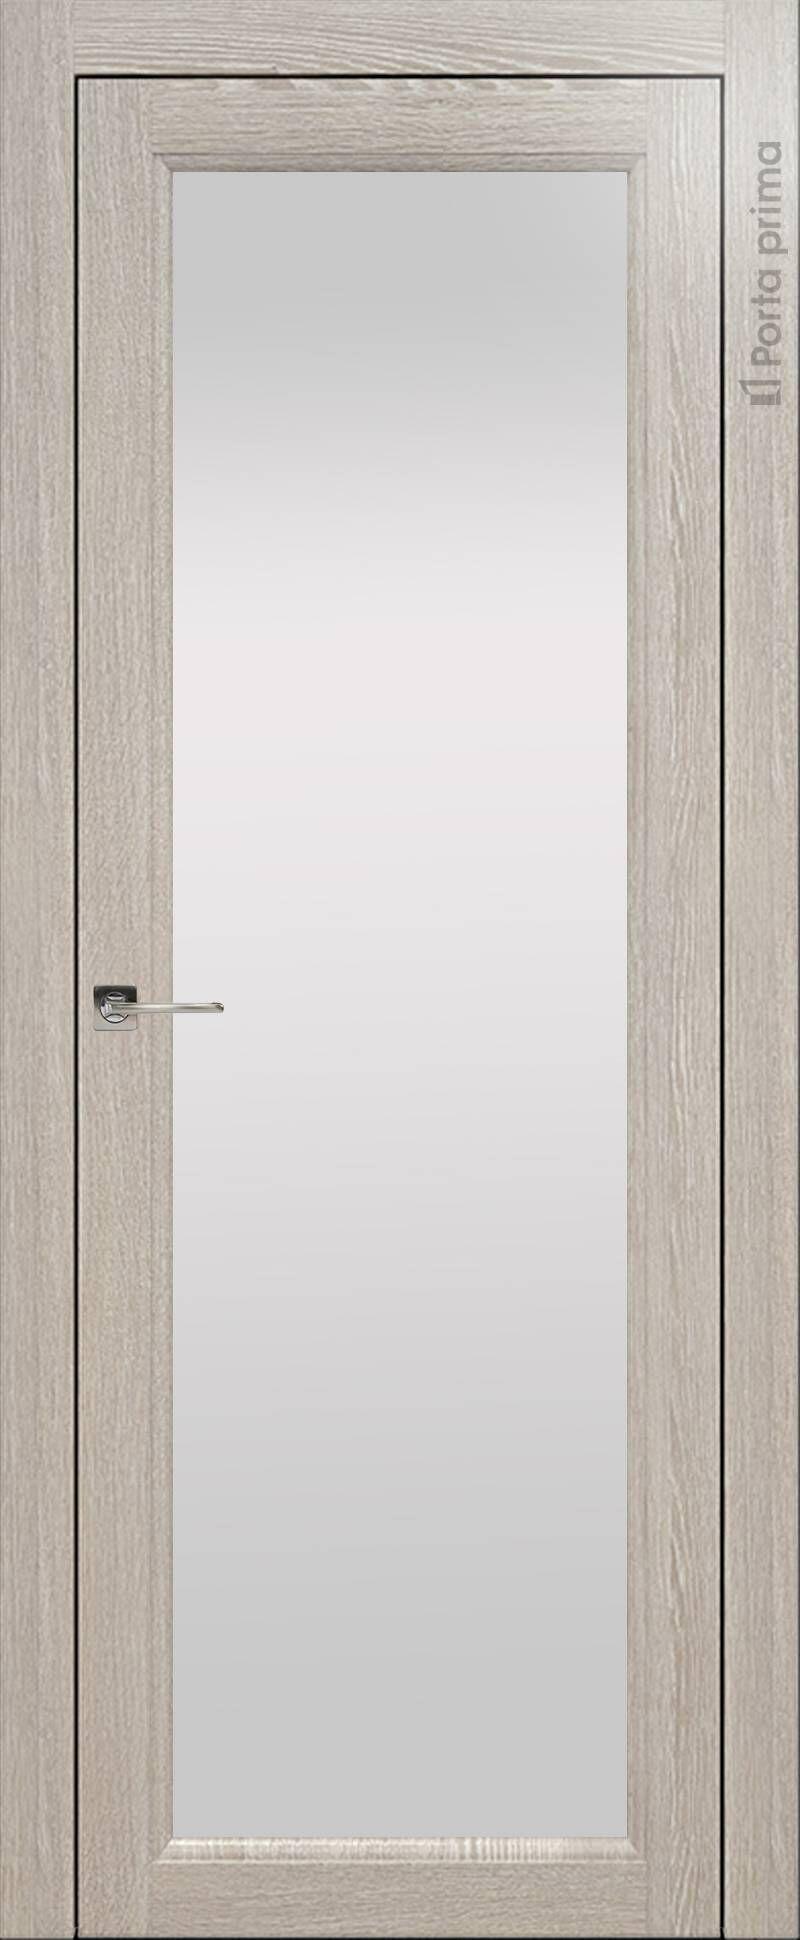 Sorrento-R Б4 цвет - Серый дуб Со стеклом (ДО)